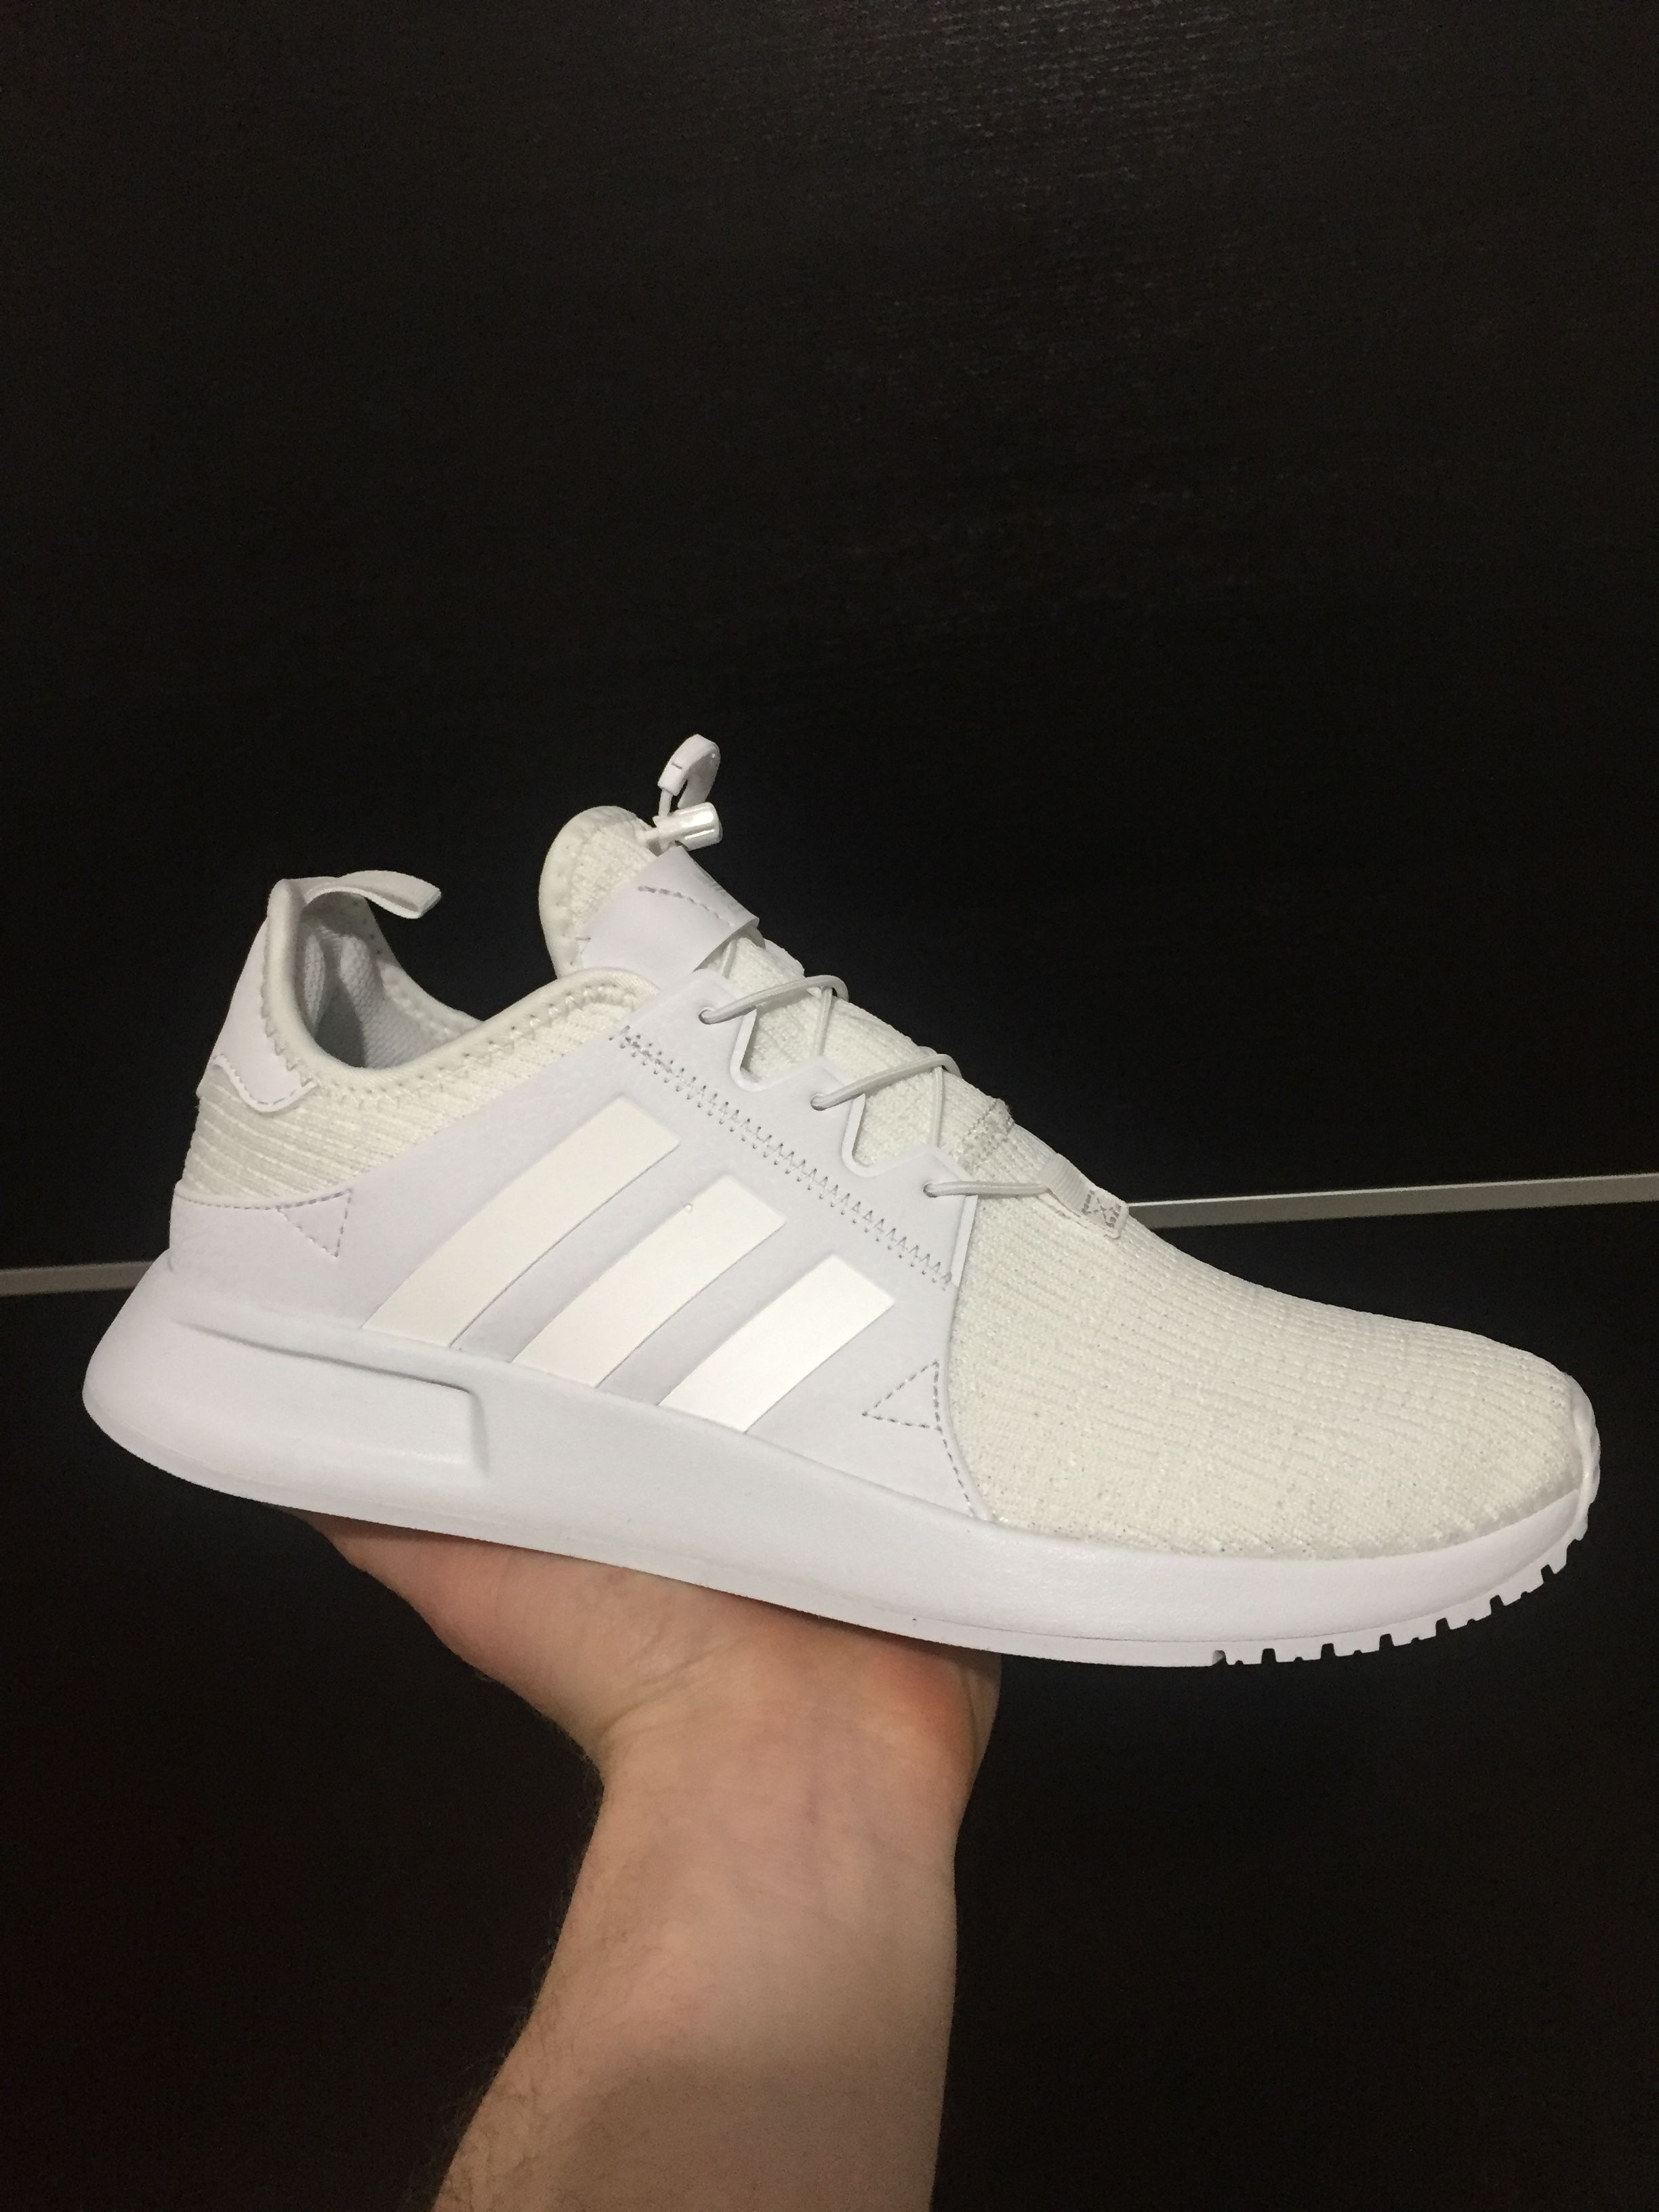 Juramento dispersión acento  Adidas x plr total White | Vestidos de encaje, Encaje, Vestidos